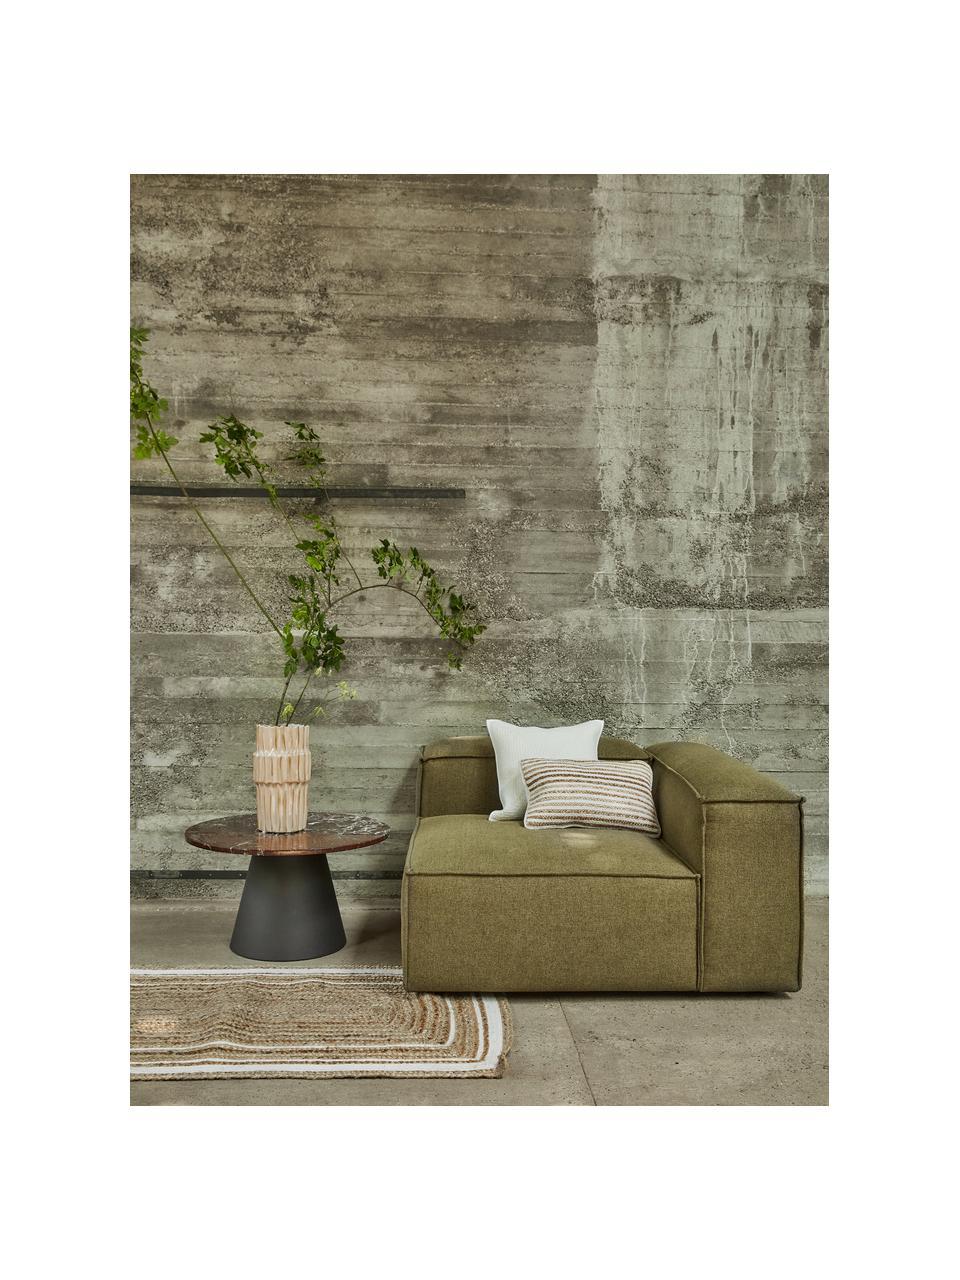 Handgewebte Jute-Fußmatte Clover, 100% Jute, Beige, 50 x 80 cm